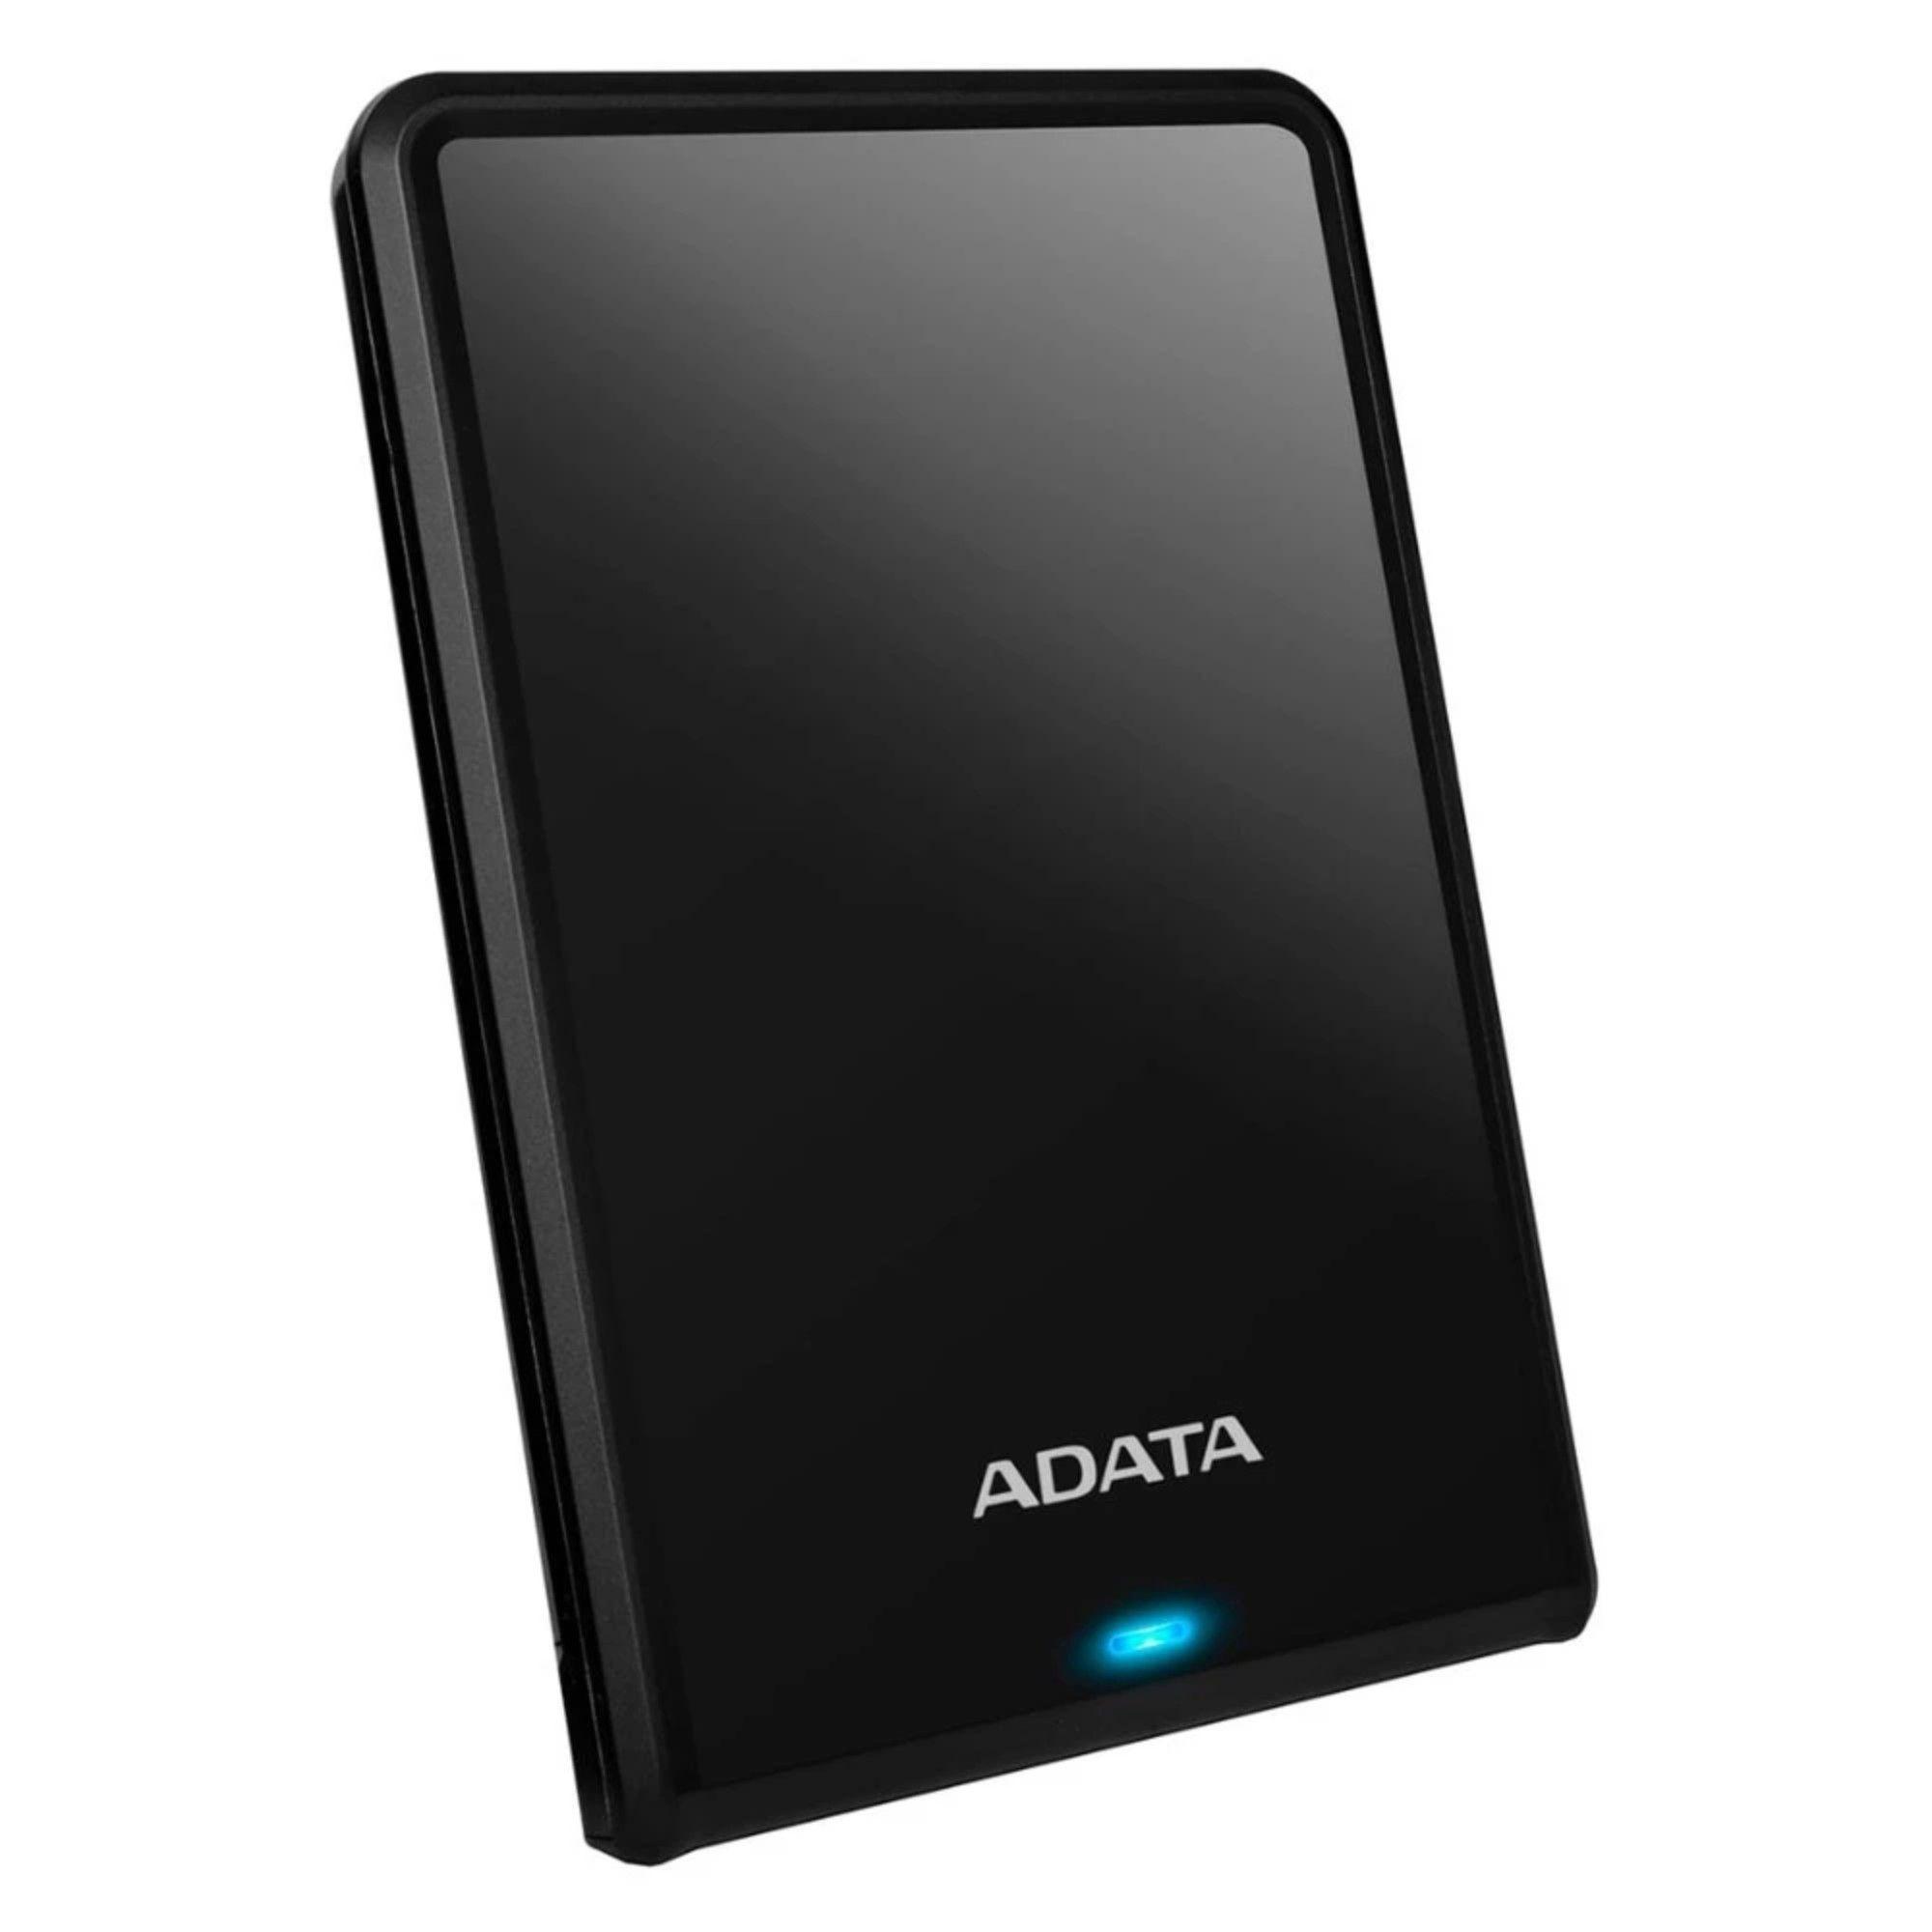 Hd Externo Adata Ahv620s-1tu3 1TB Preto